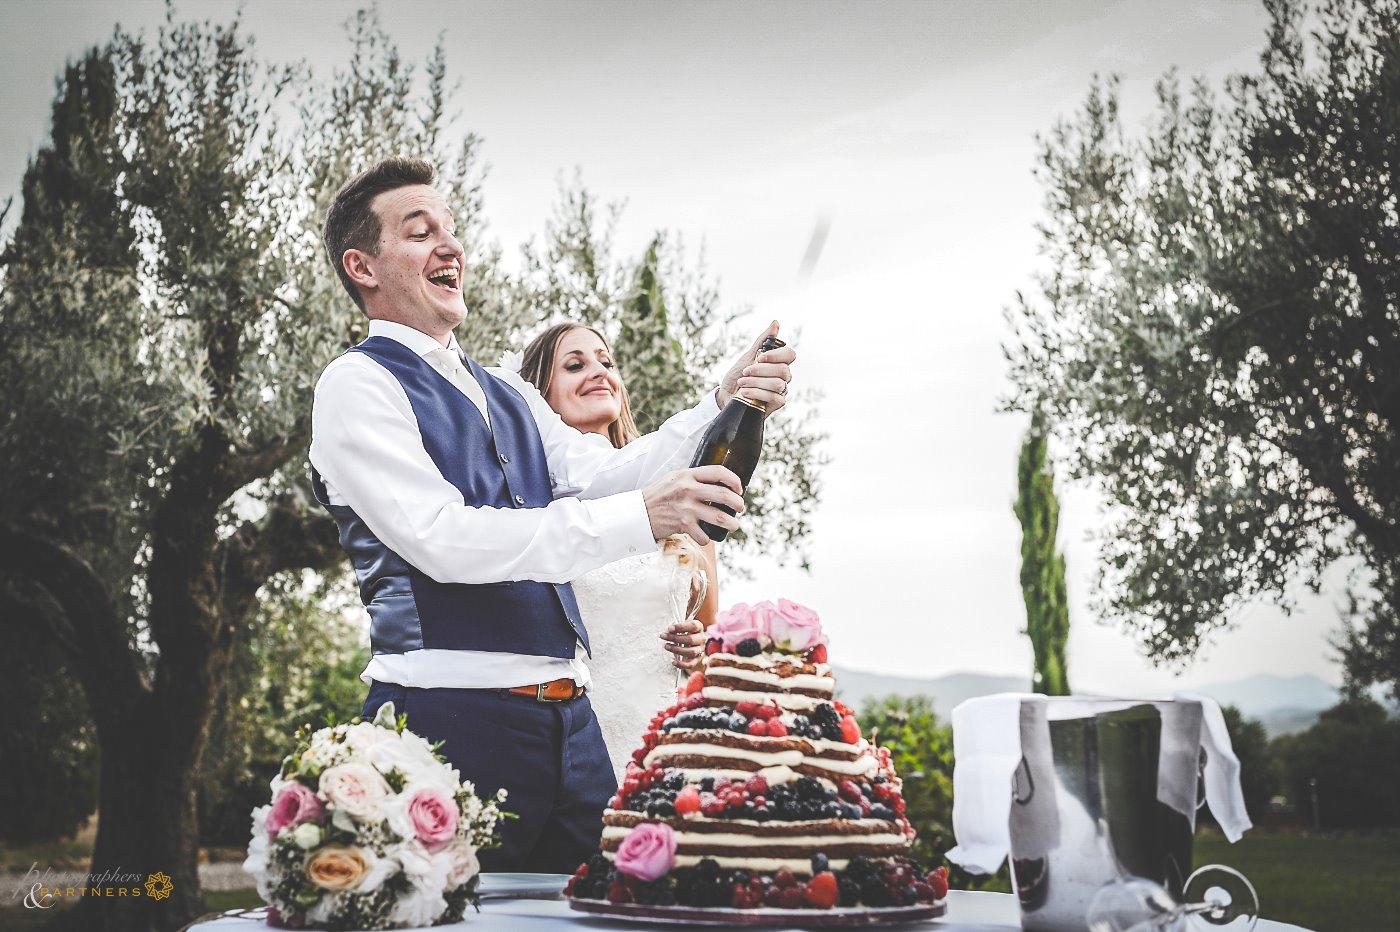 photography_weddings_scarlino_19.jpg